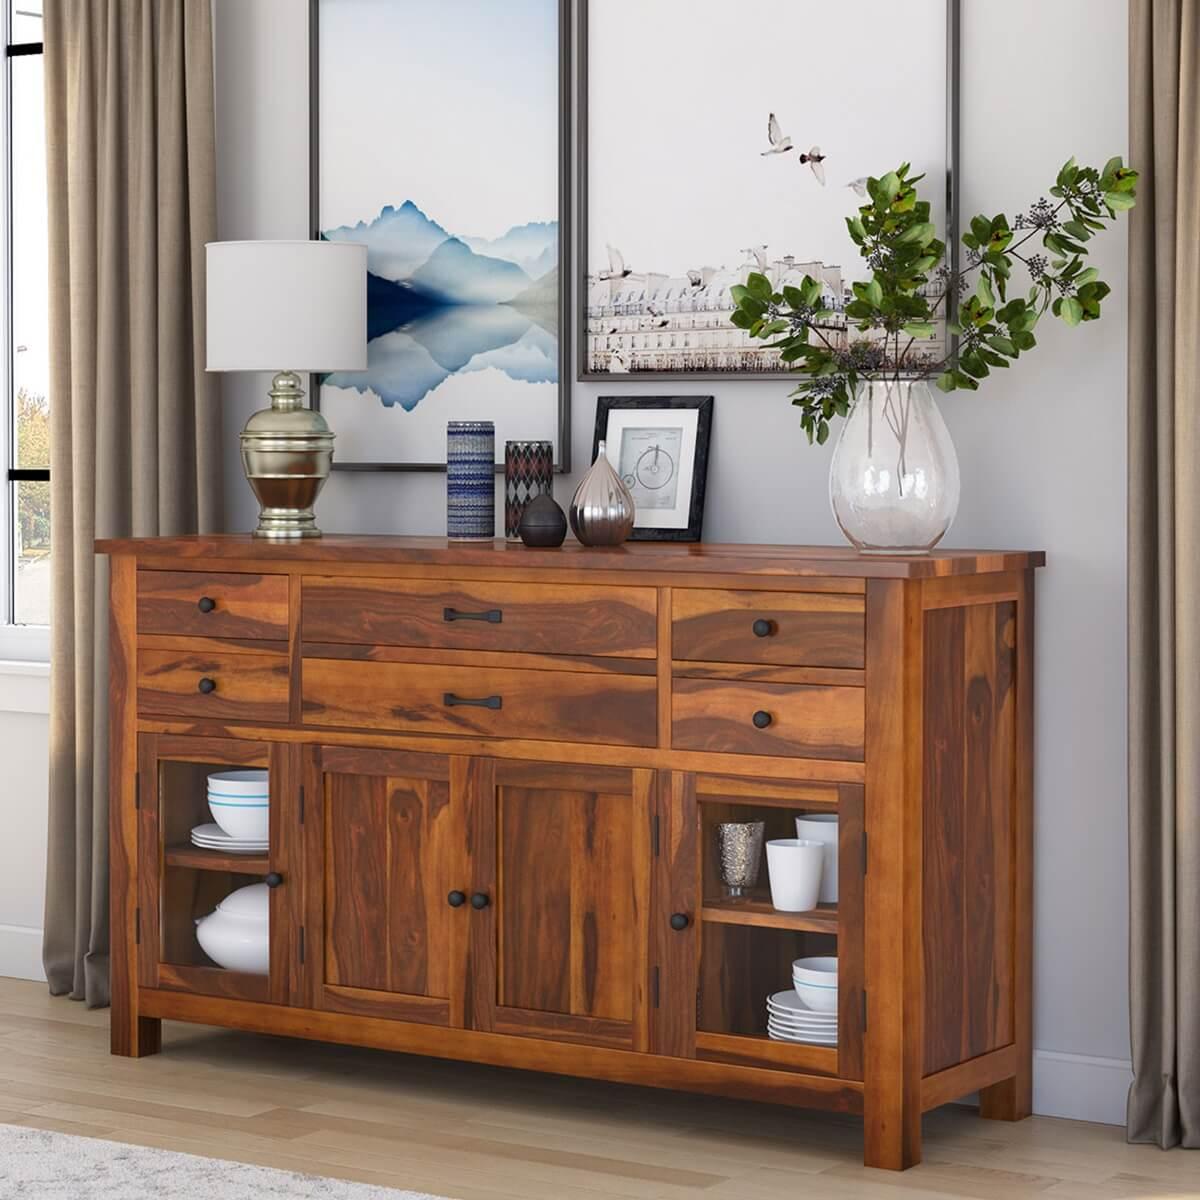 Cloverdale Solid Wood Glass Door 6 Drawer Large Sideboard Cabinet